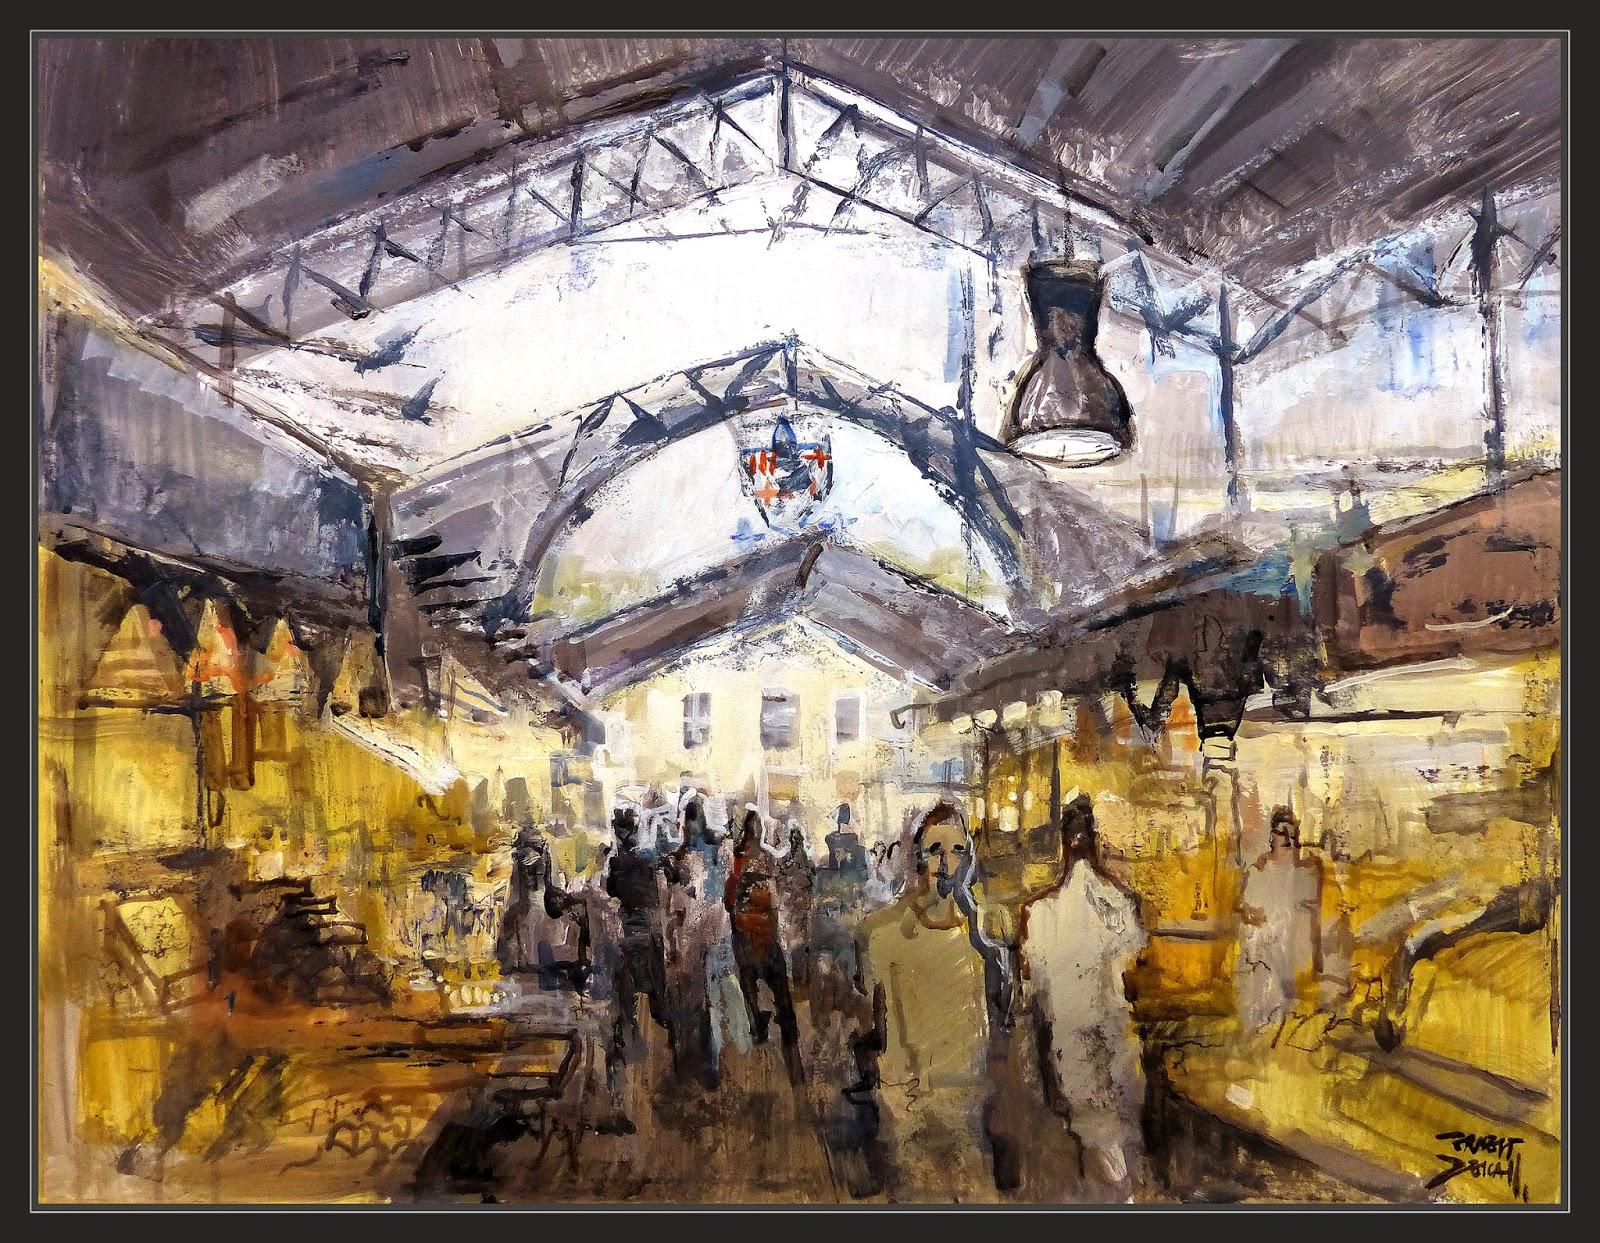 Ernest descals artista pintor mercat de la boqueria - Trabajo de pintor en barcelona ...